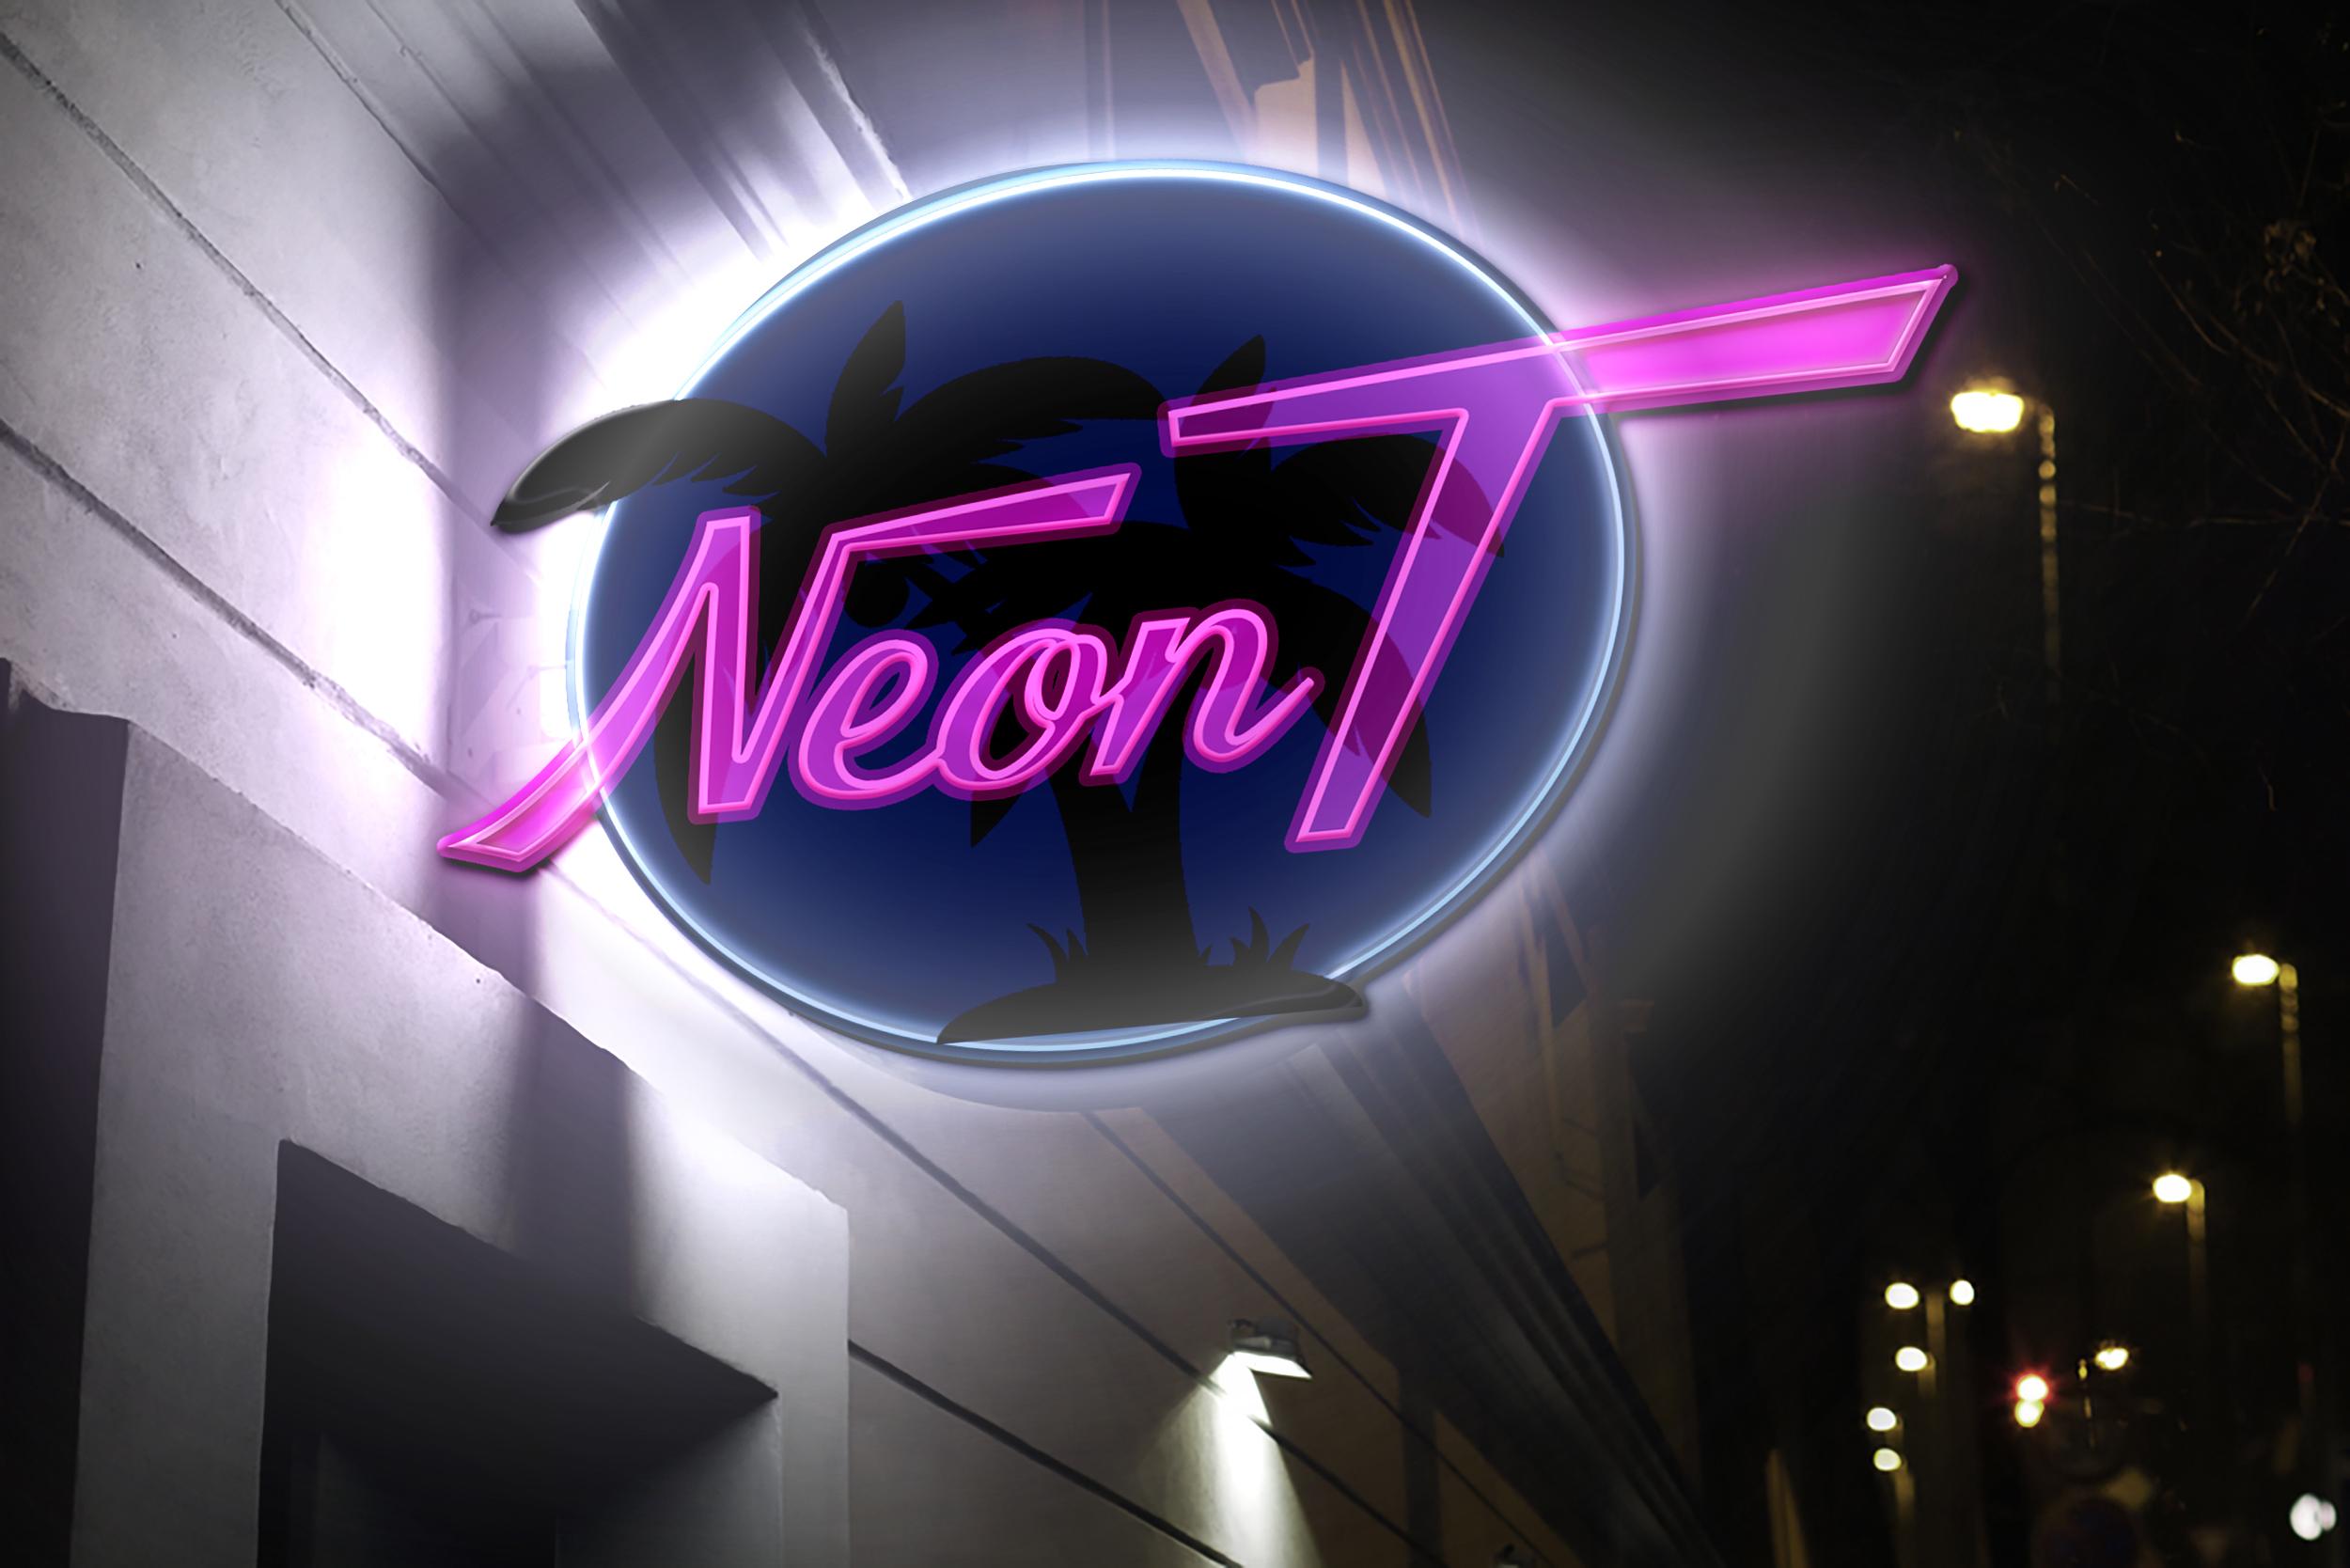 NeonT